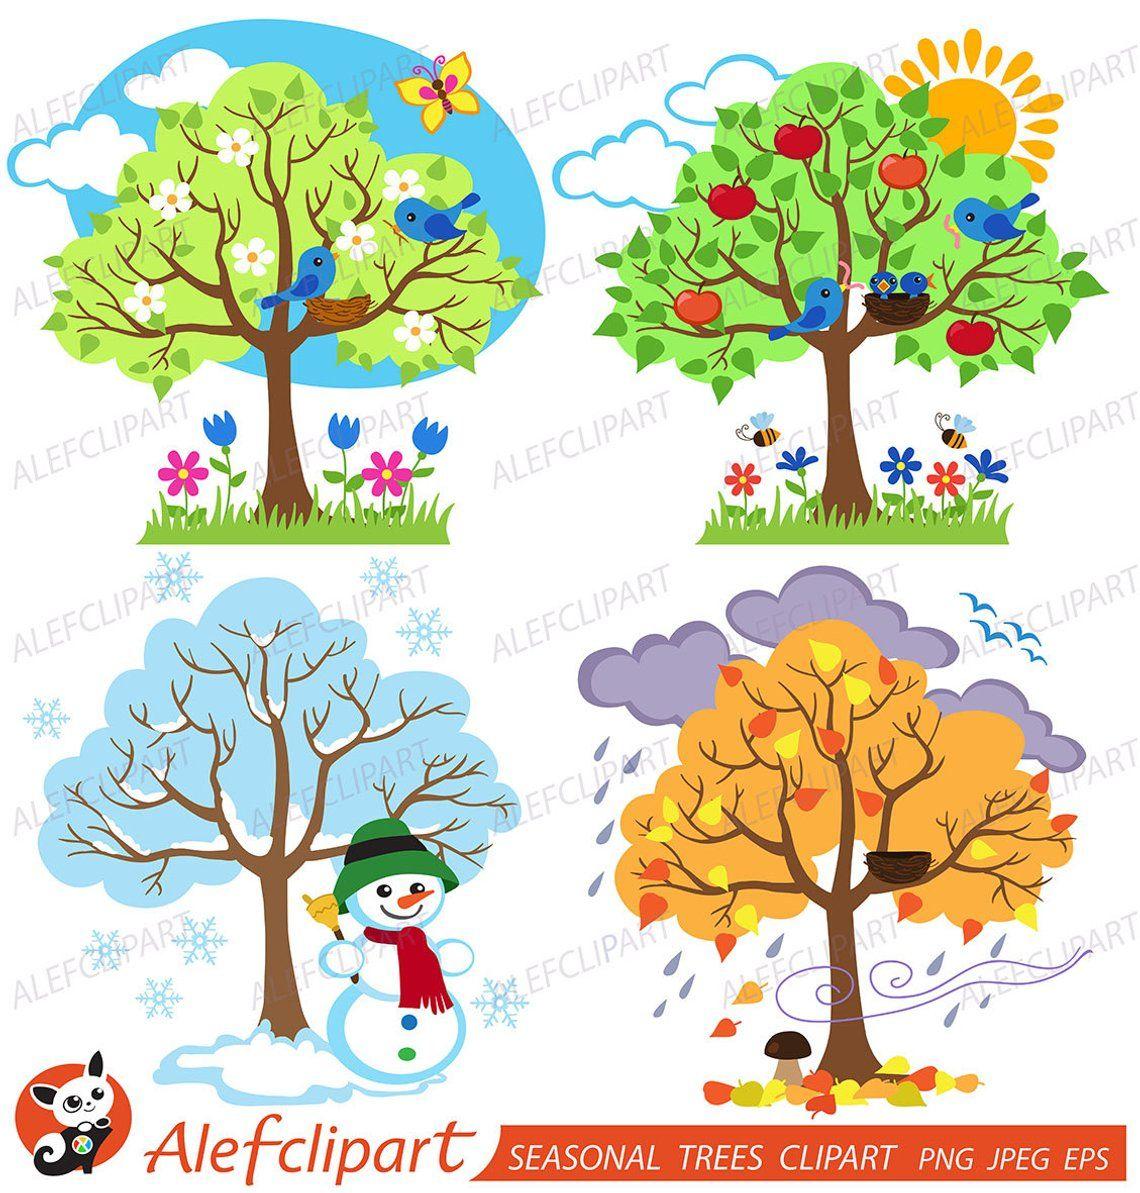 Four Seasons Trees Clipart Seasonal Trees and Birds Clipart.